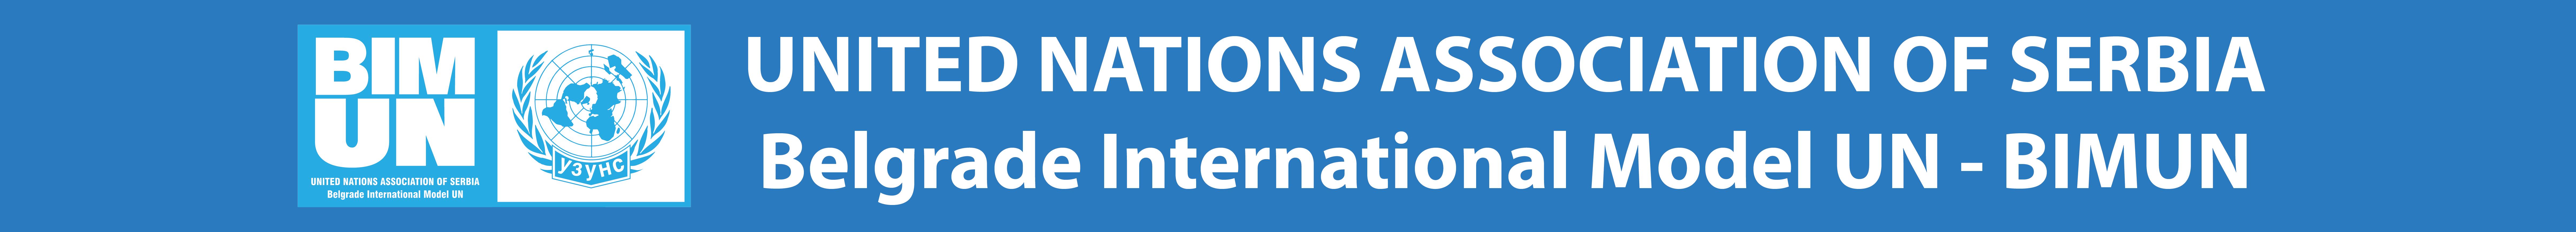 Belgrade International Model United Nations - BIMUN